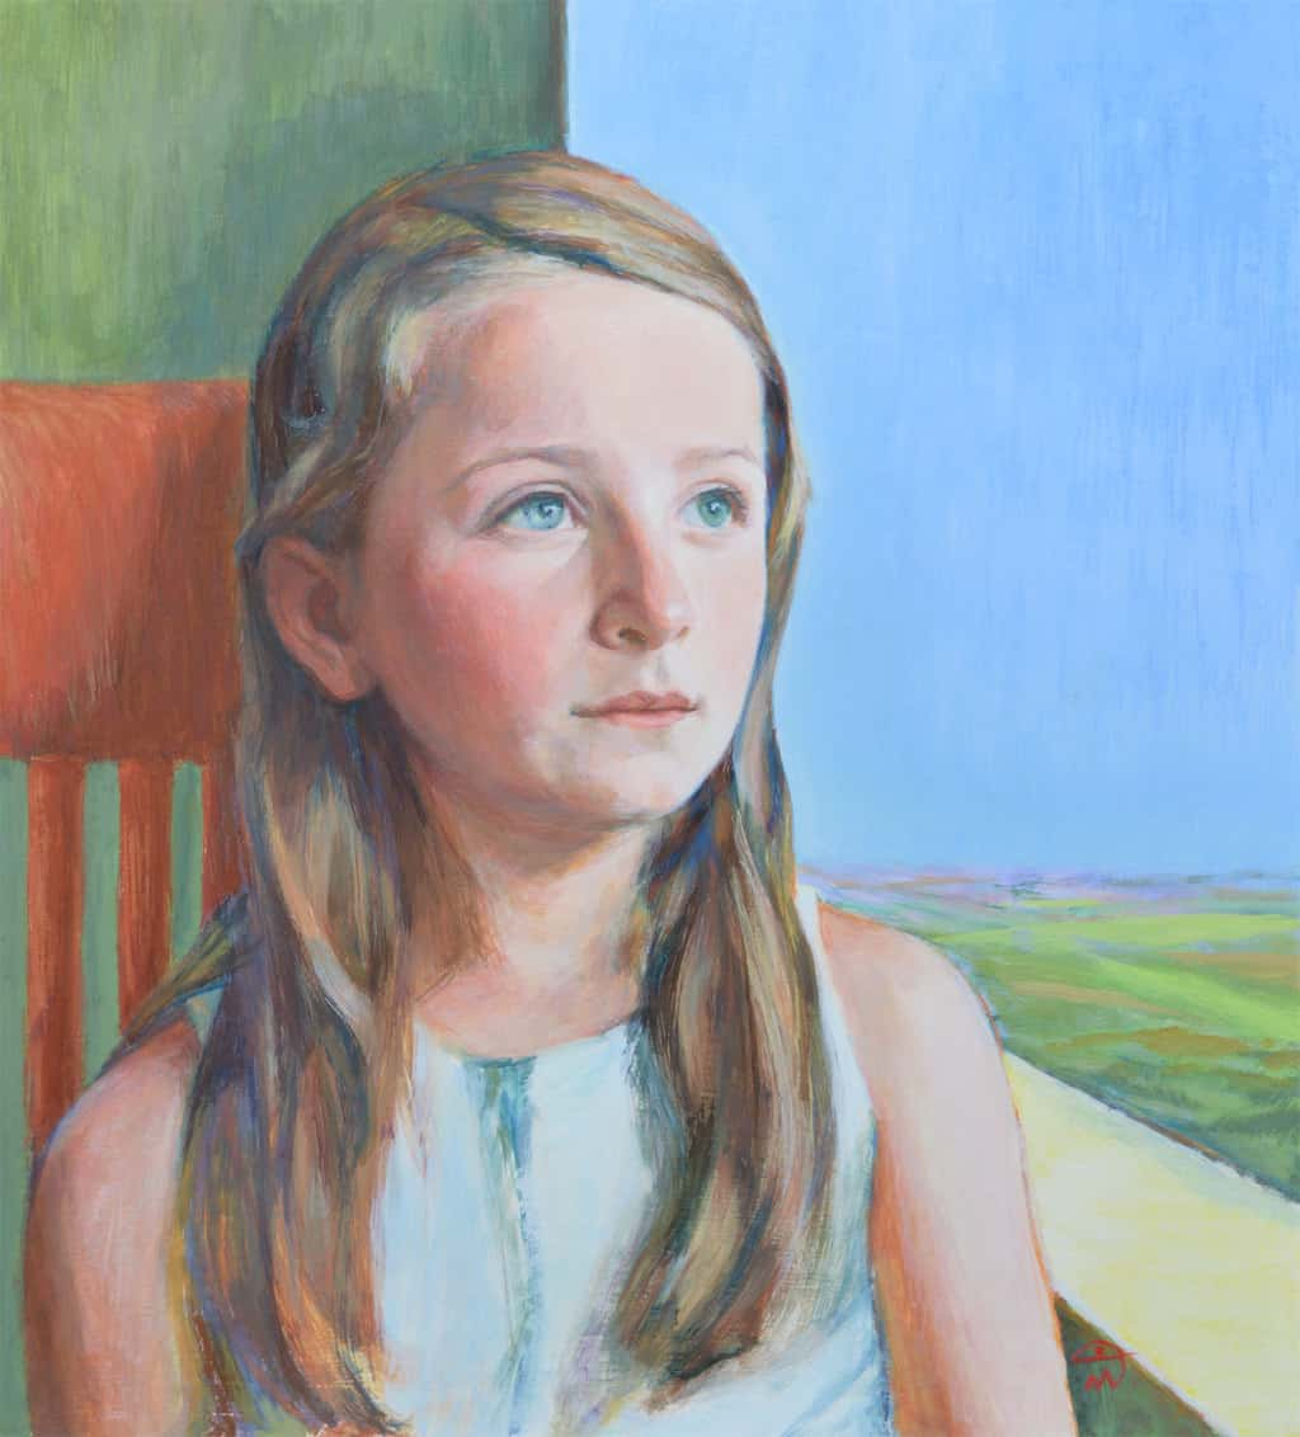 Portrait of Alice. Tempera on board. Portrait commission by the British artist Marina Kim